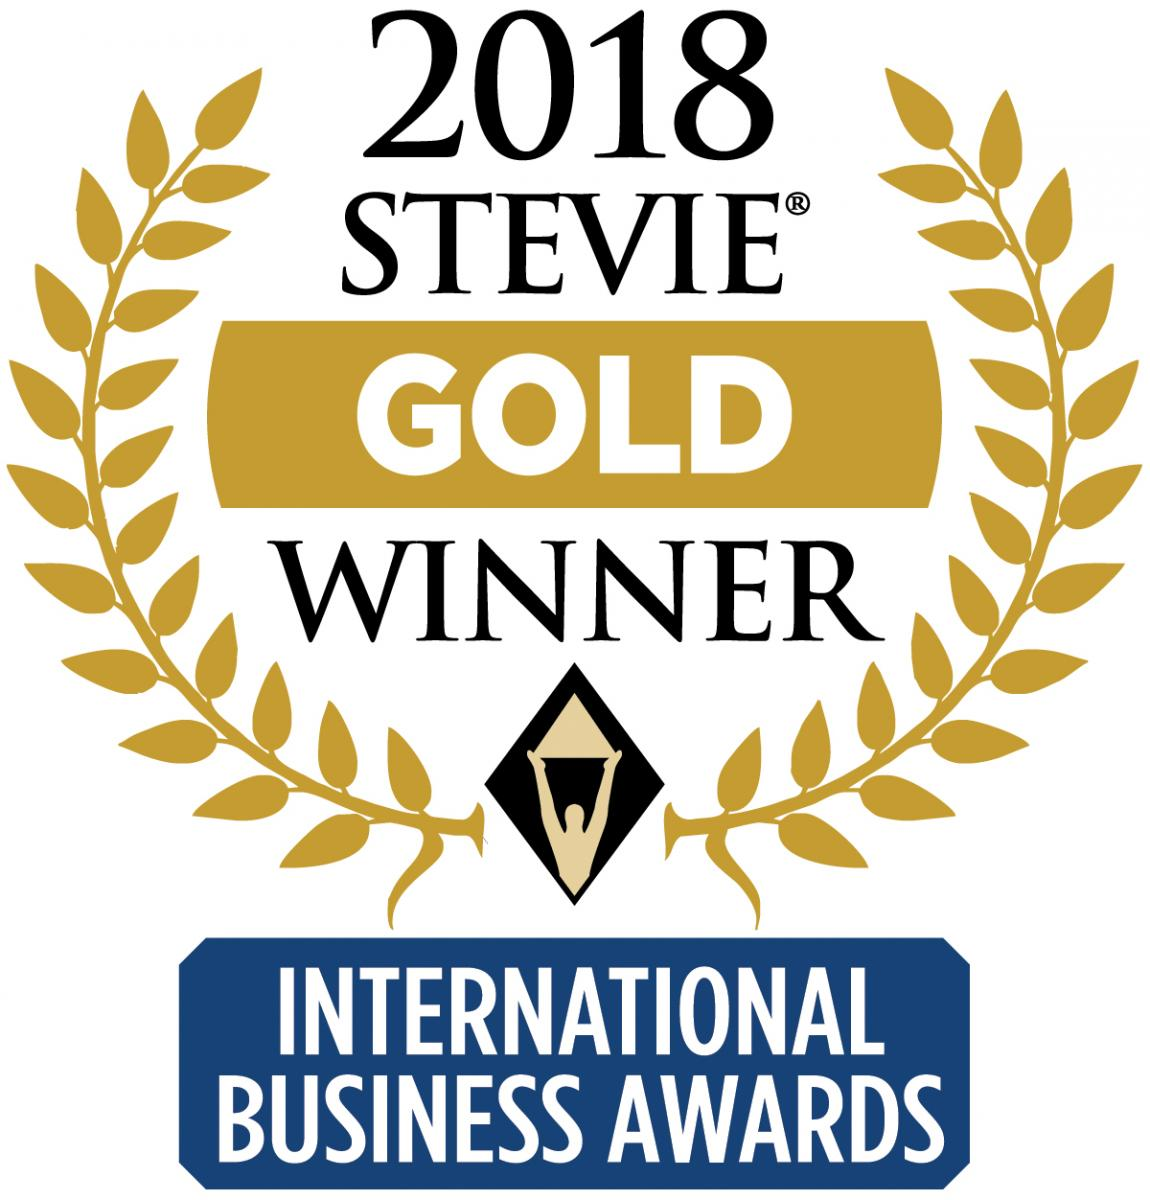 2018 IBA Gold Winner